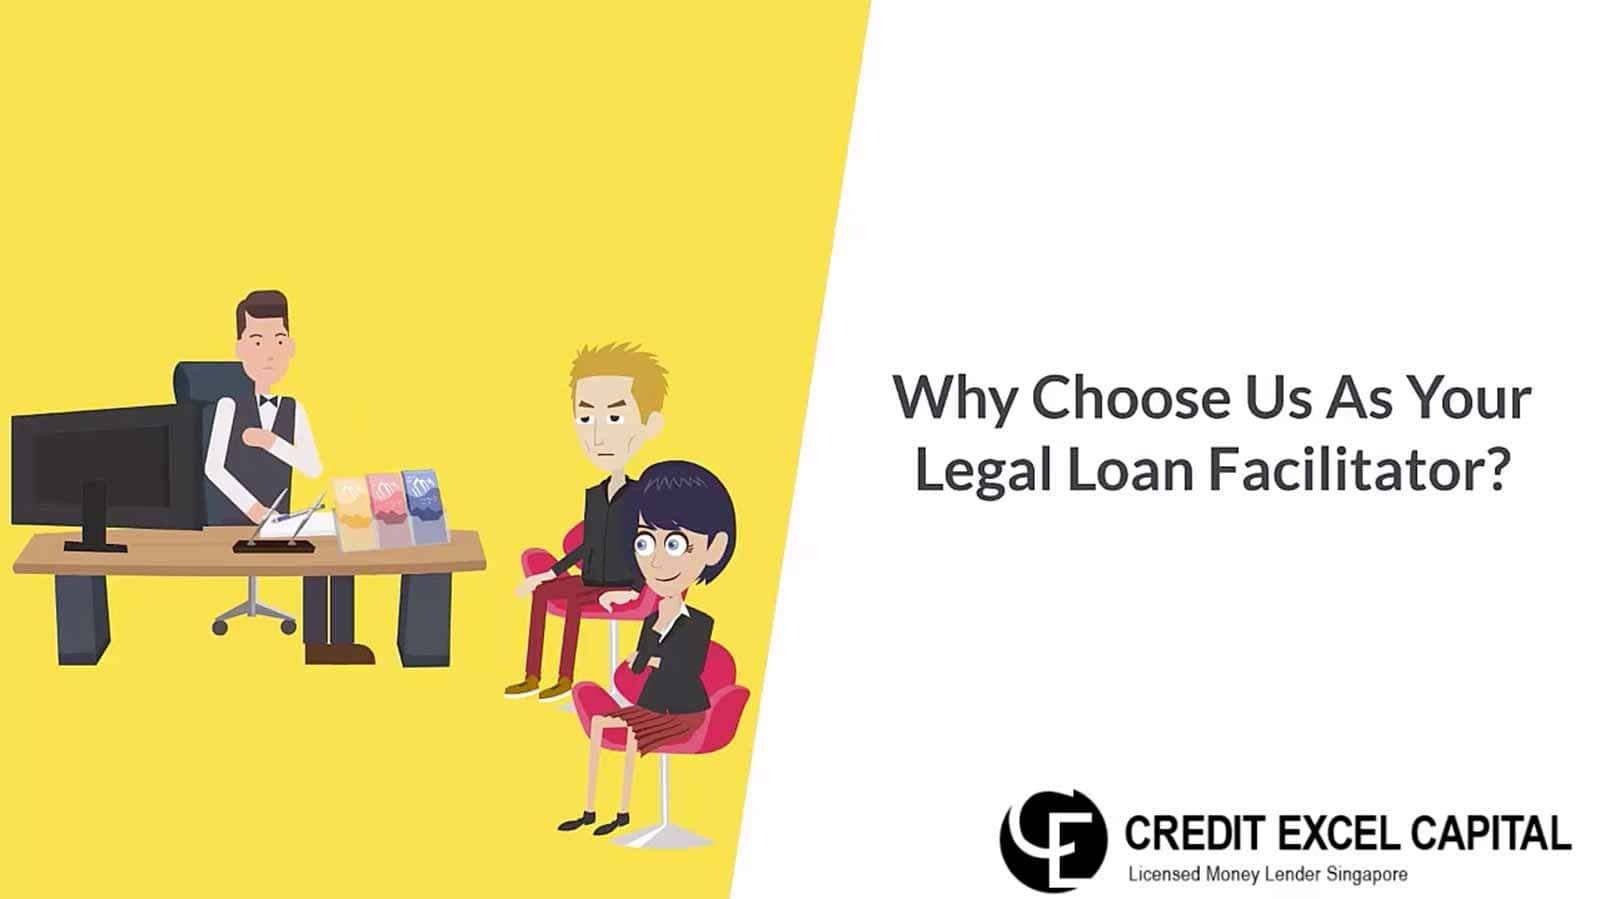 Credit Excel Capital Licensed MoneyLender Singapore Video